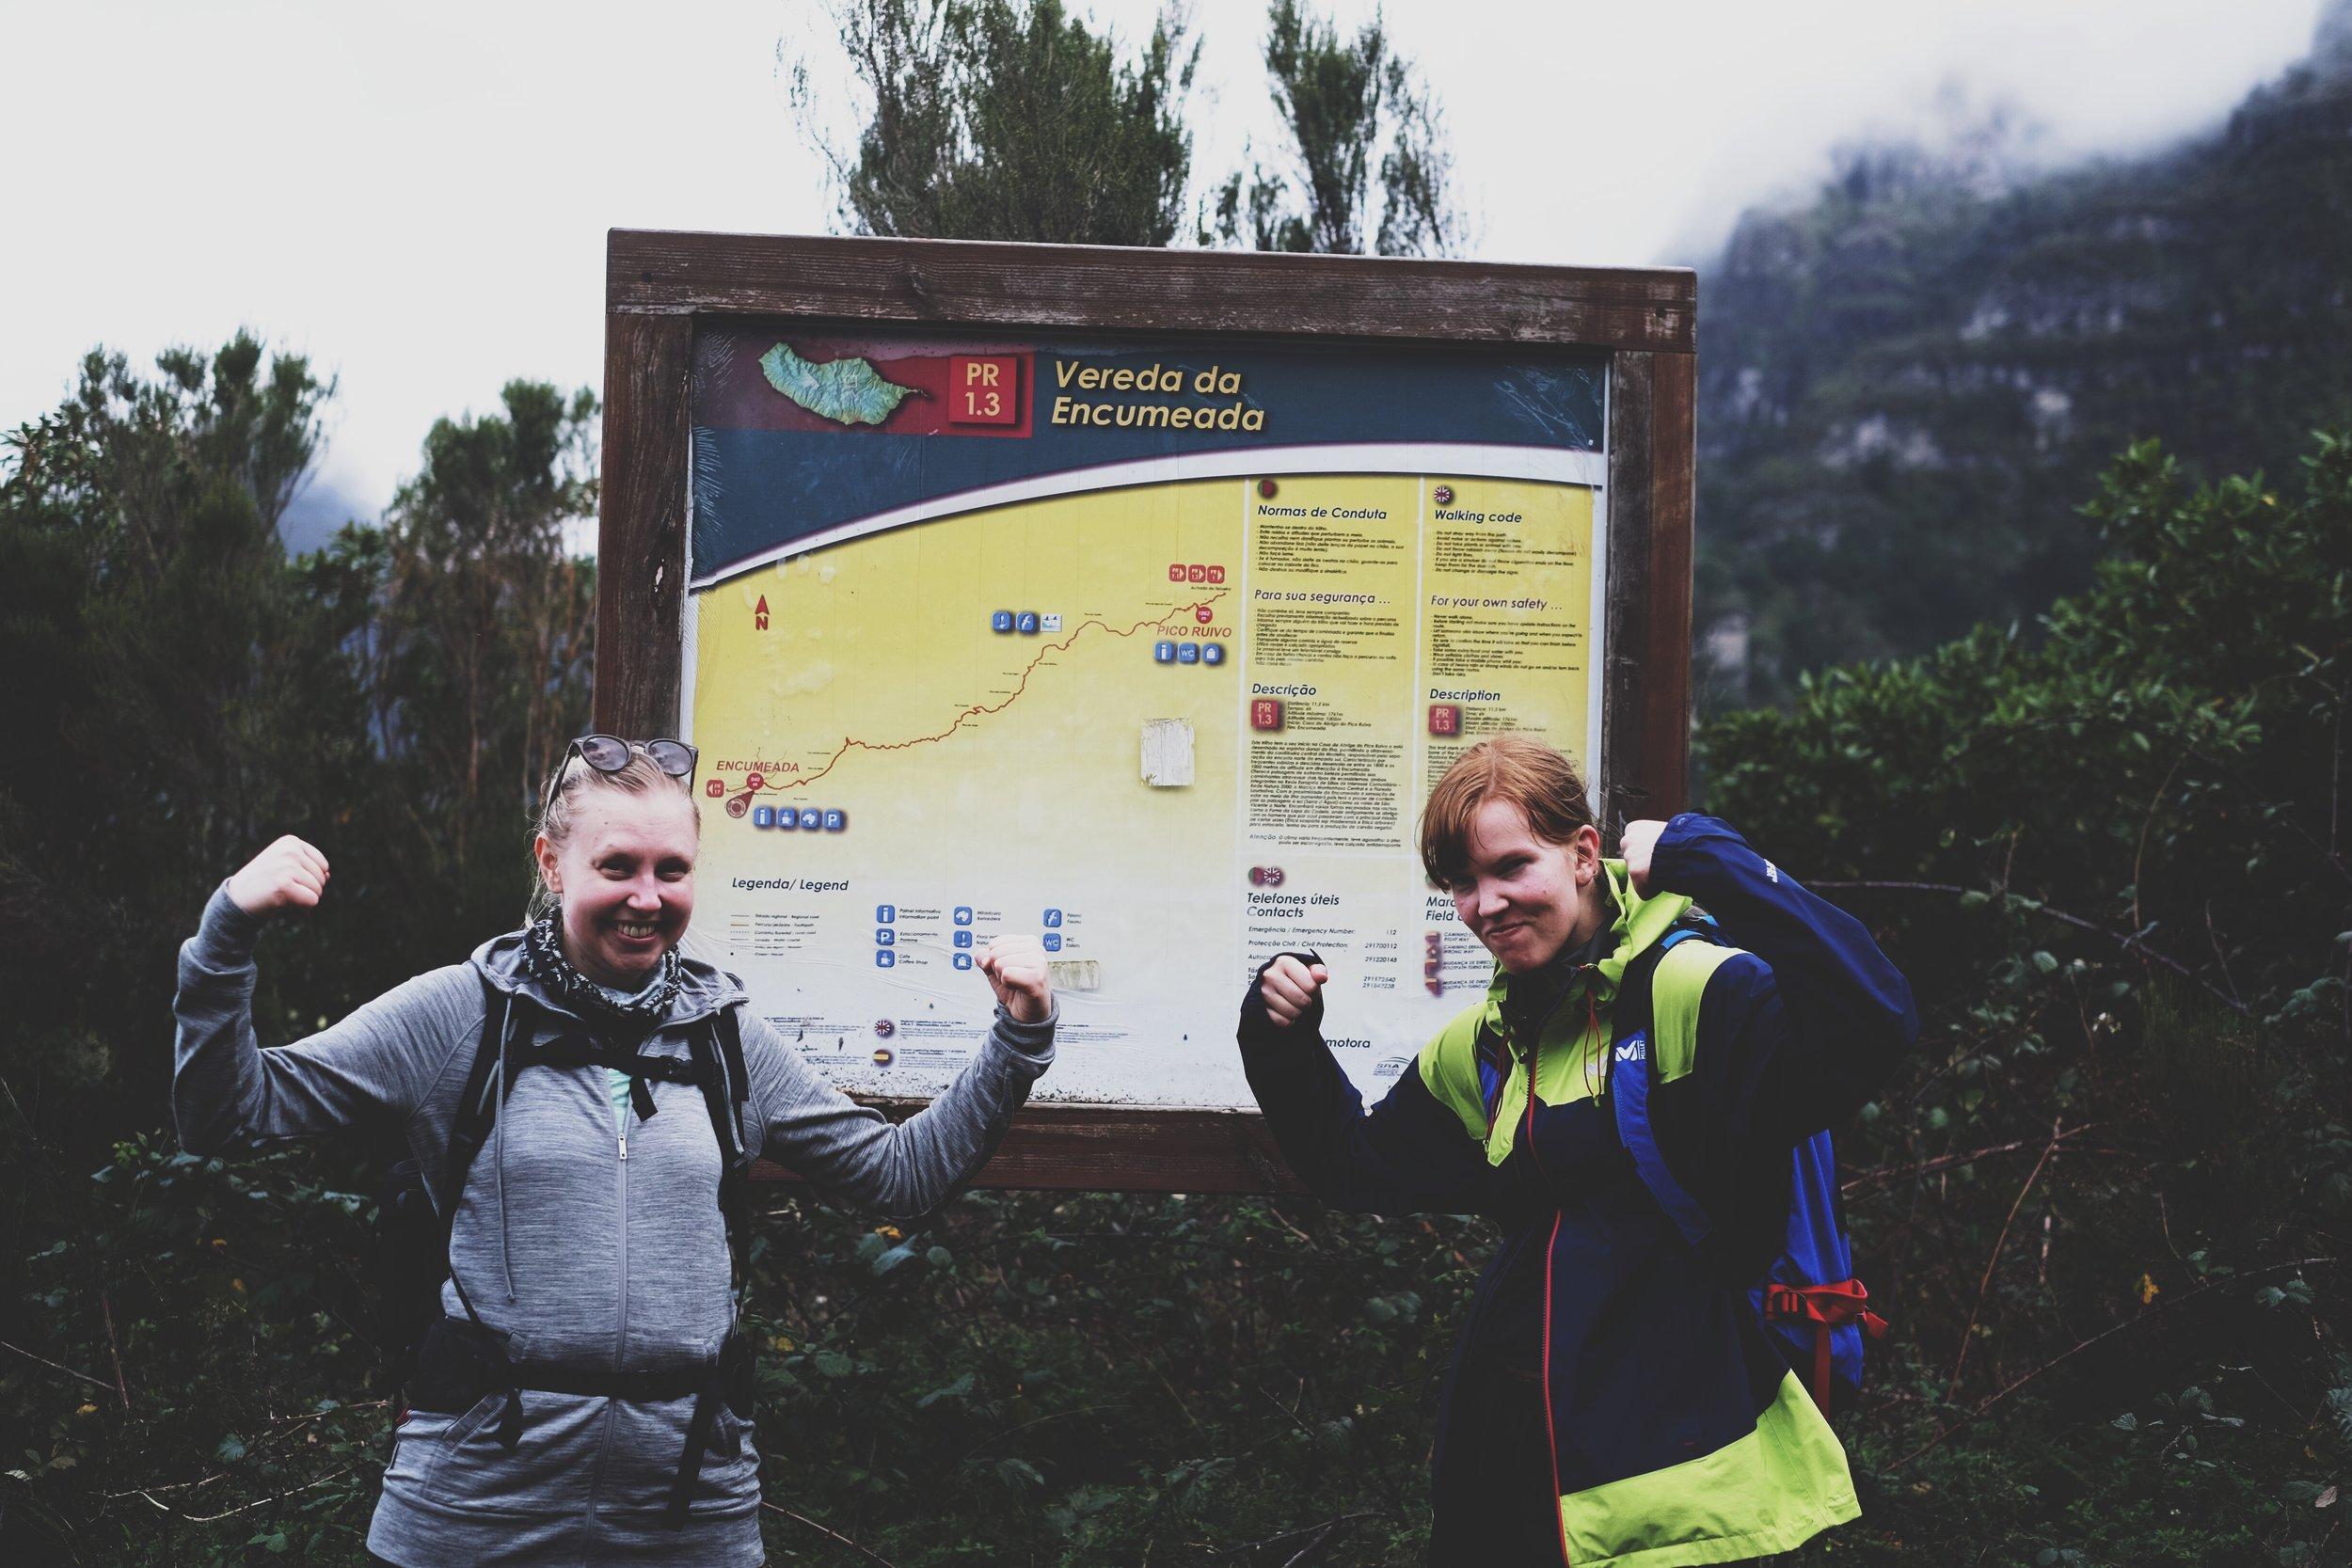 My trusty traveling companions  Kopisto &  Annamannaa after finishing the hike